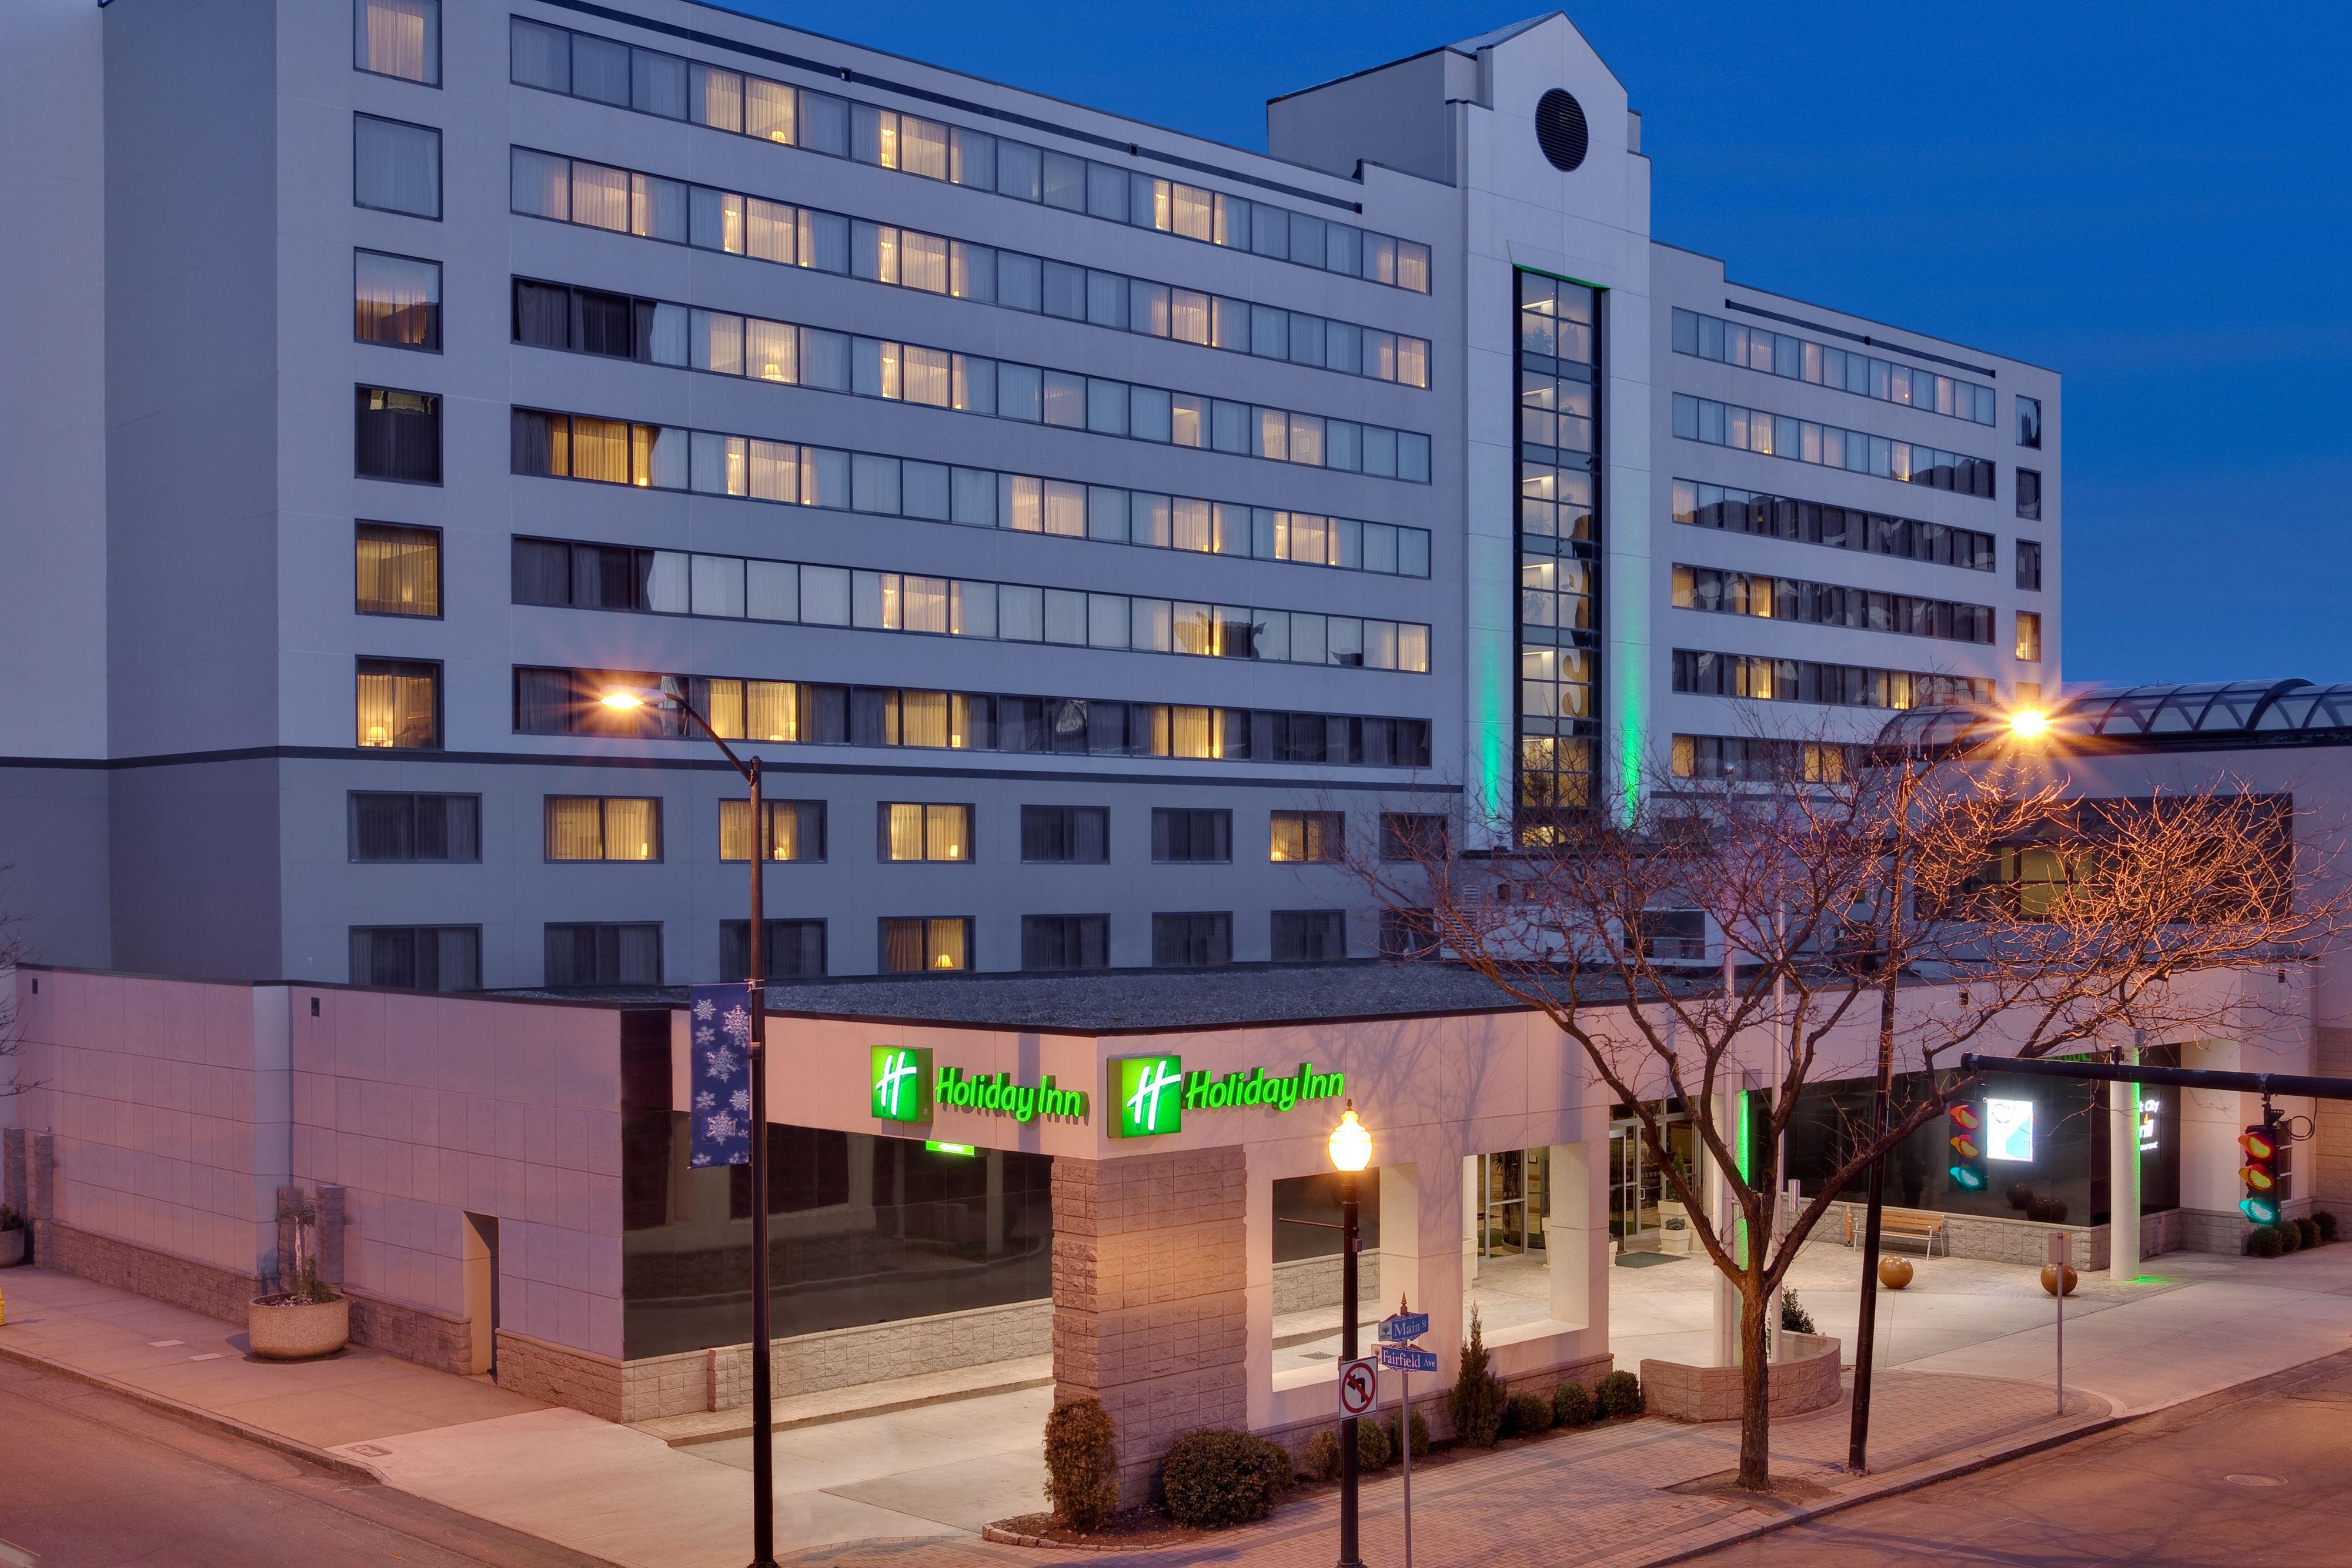 Holiday Inn Boston Dedham Htl Amp Conf Ctr Dedham